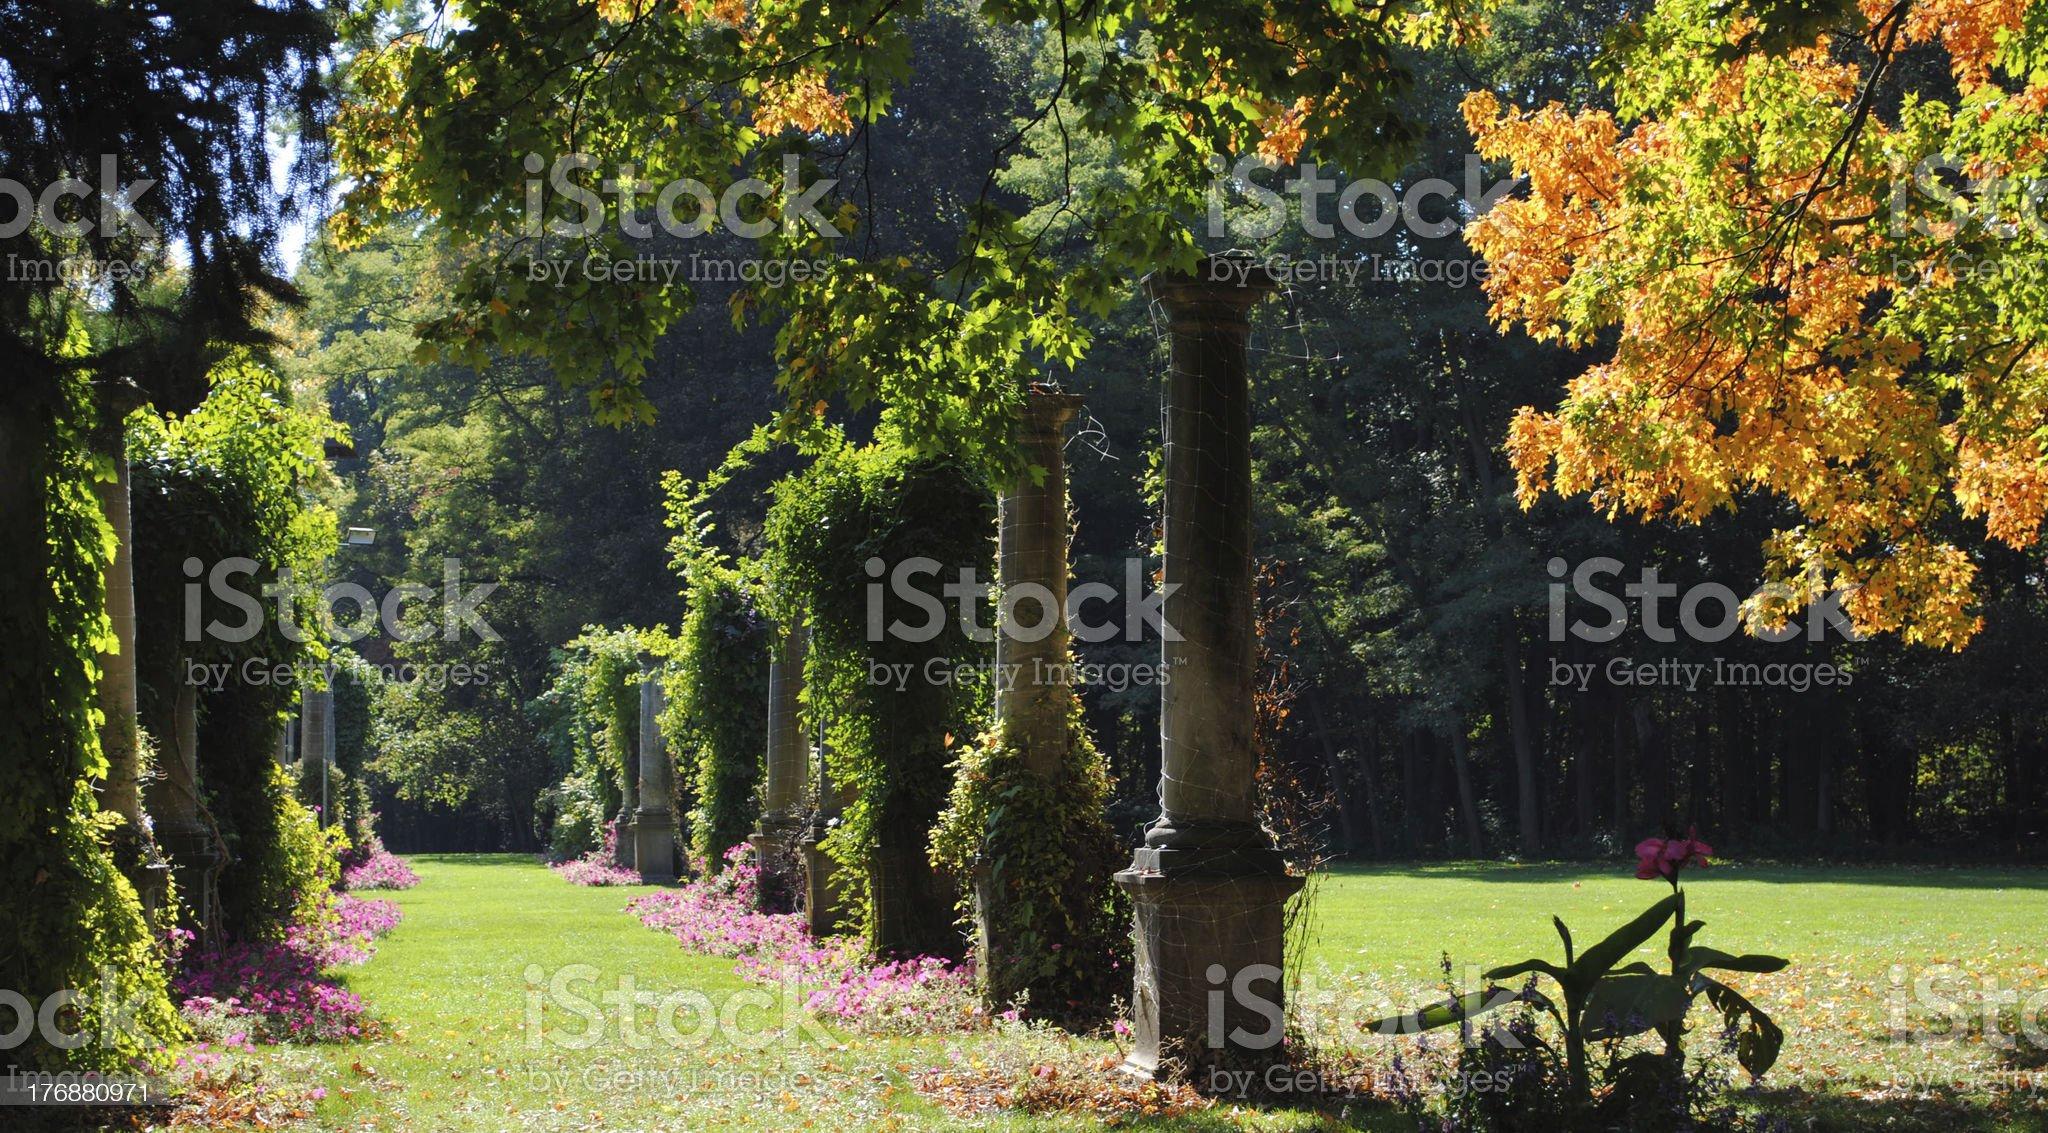 Garden Pillars royalty-free stock photo